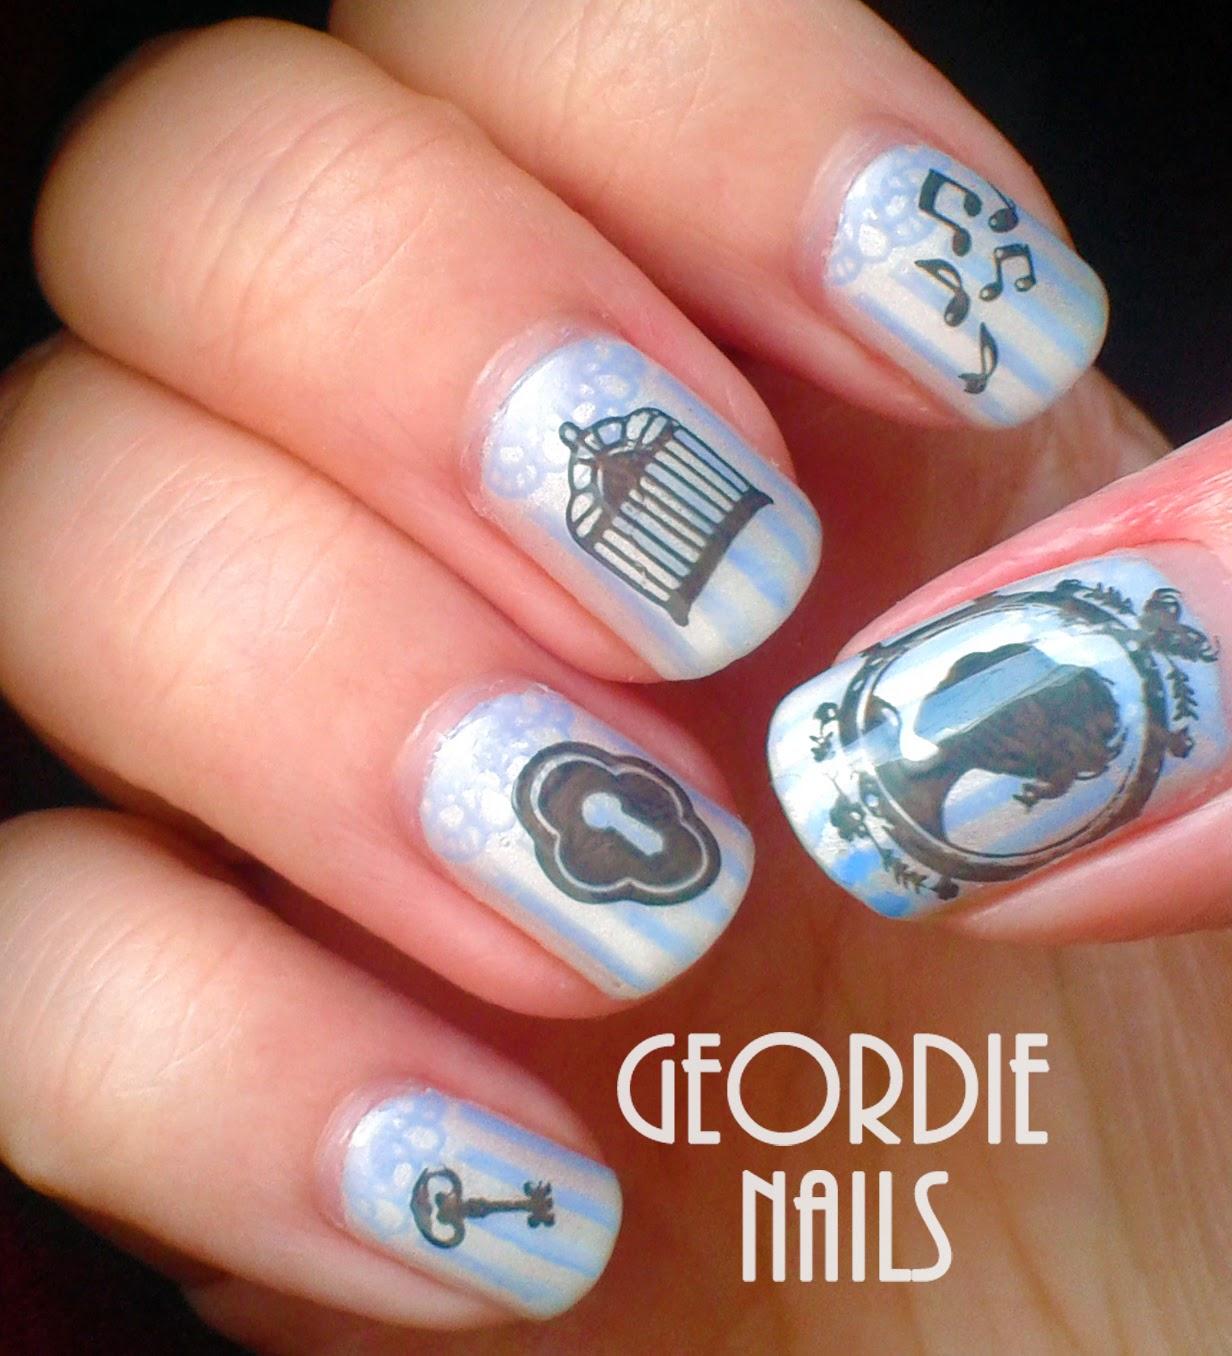 Geordie Nails: Victorian Manicure